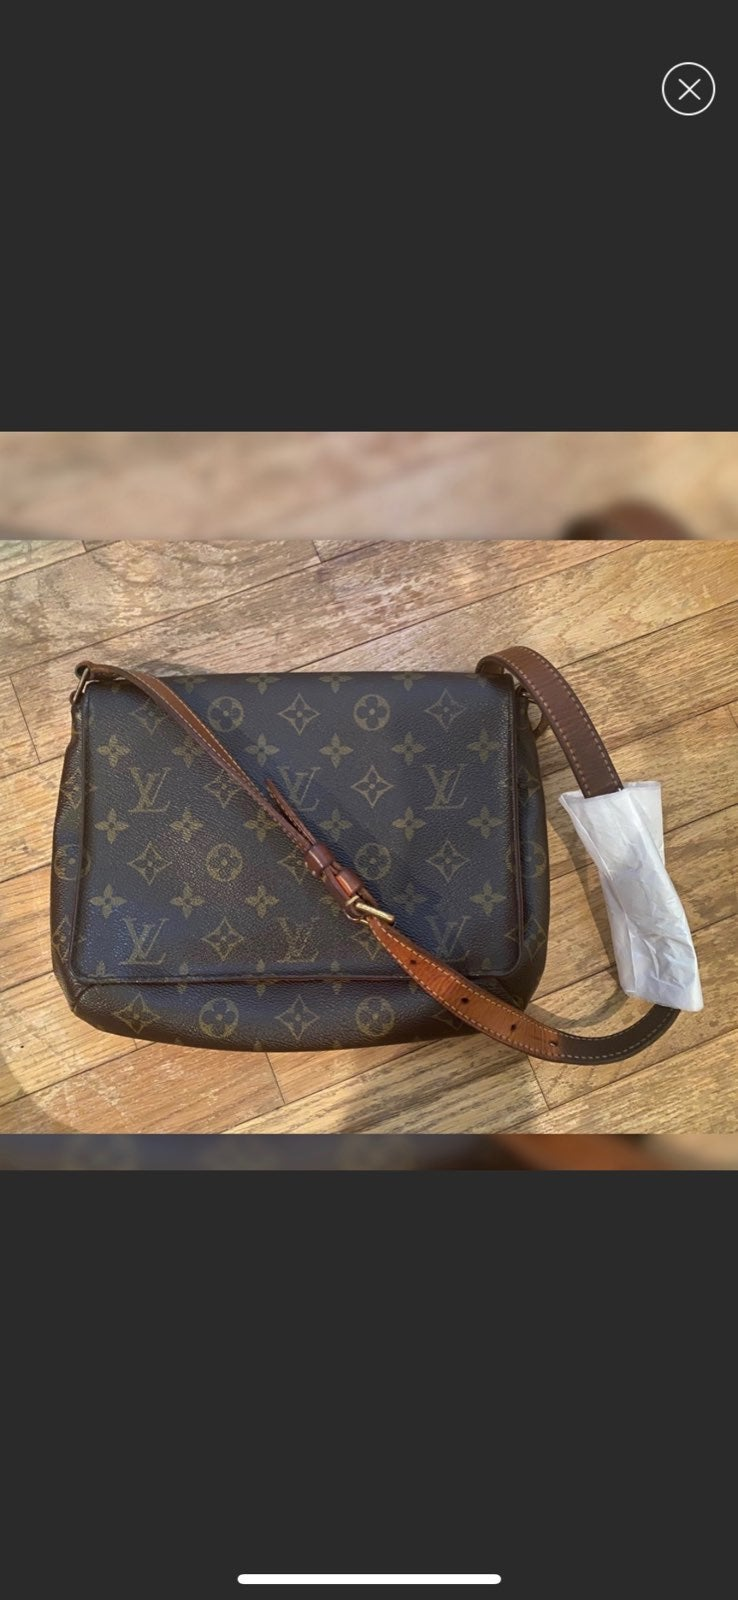 Louis Vuitton Musette Tango Short Bag